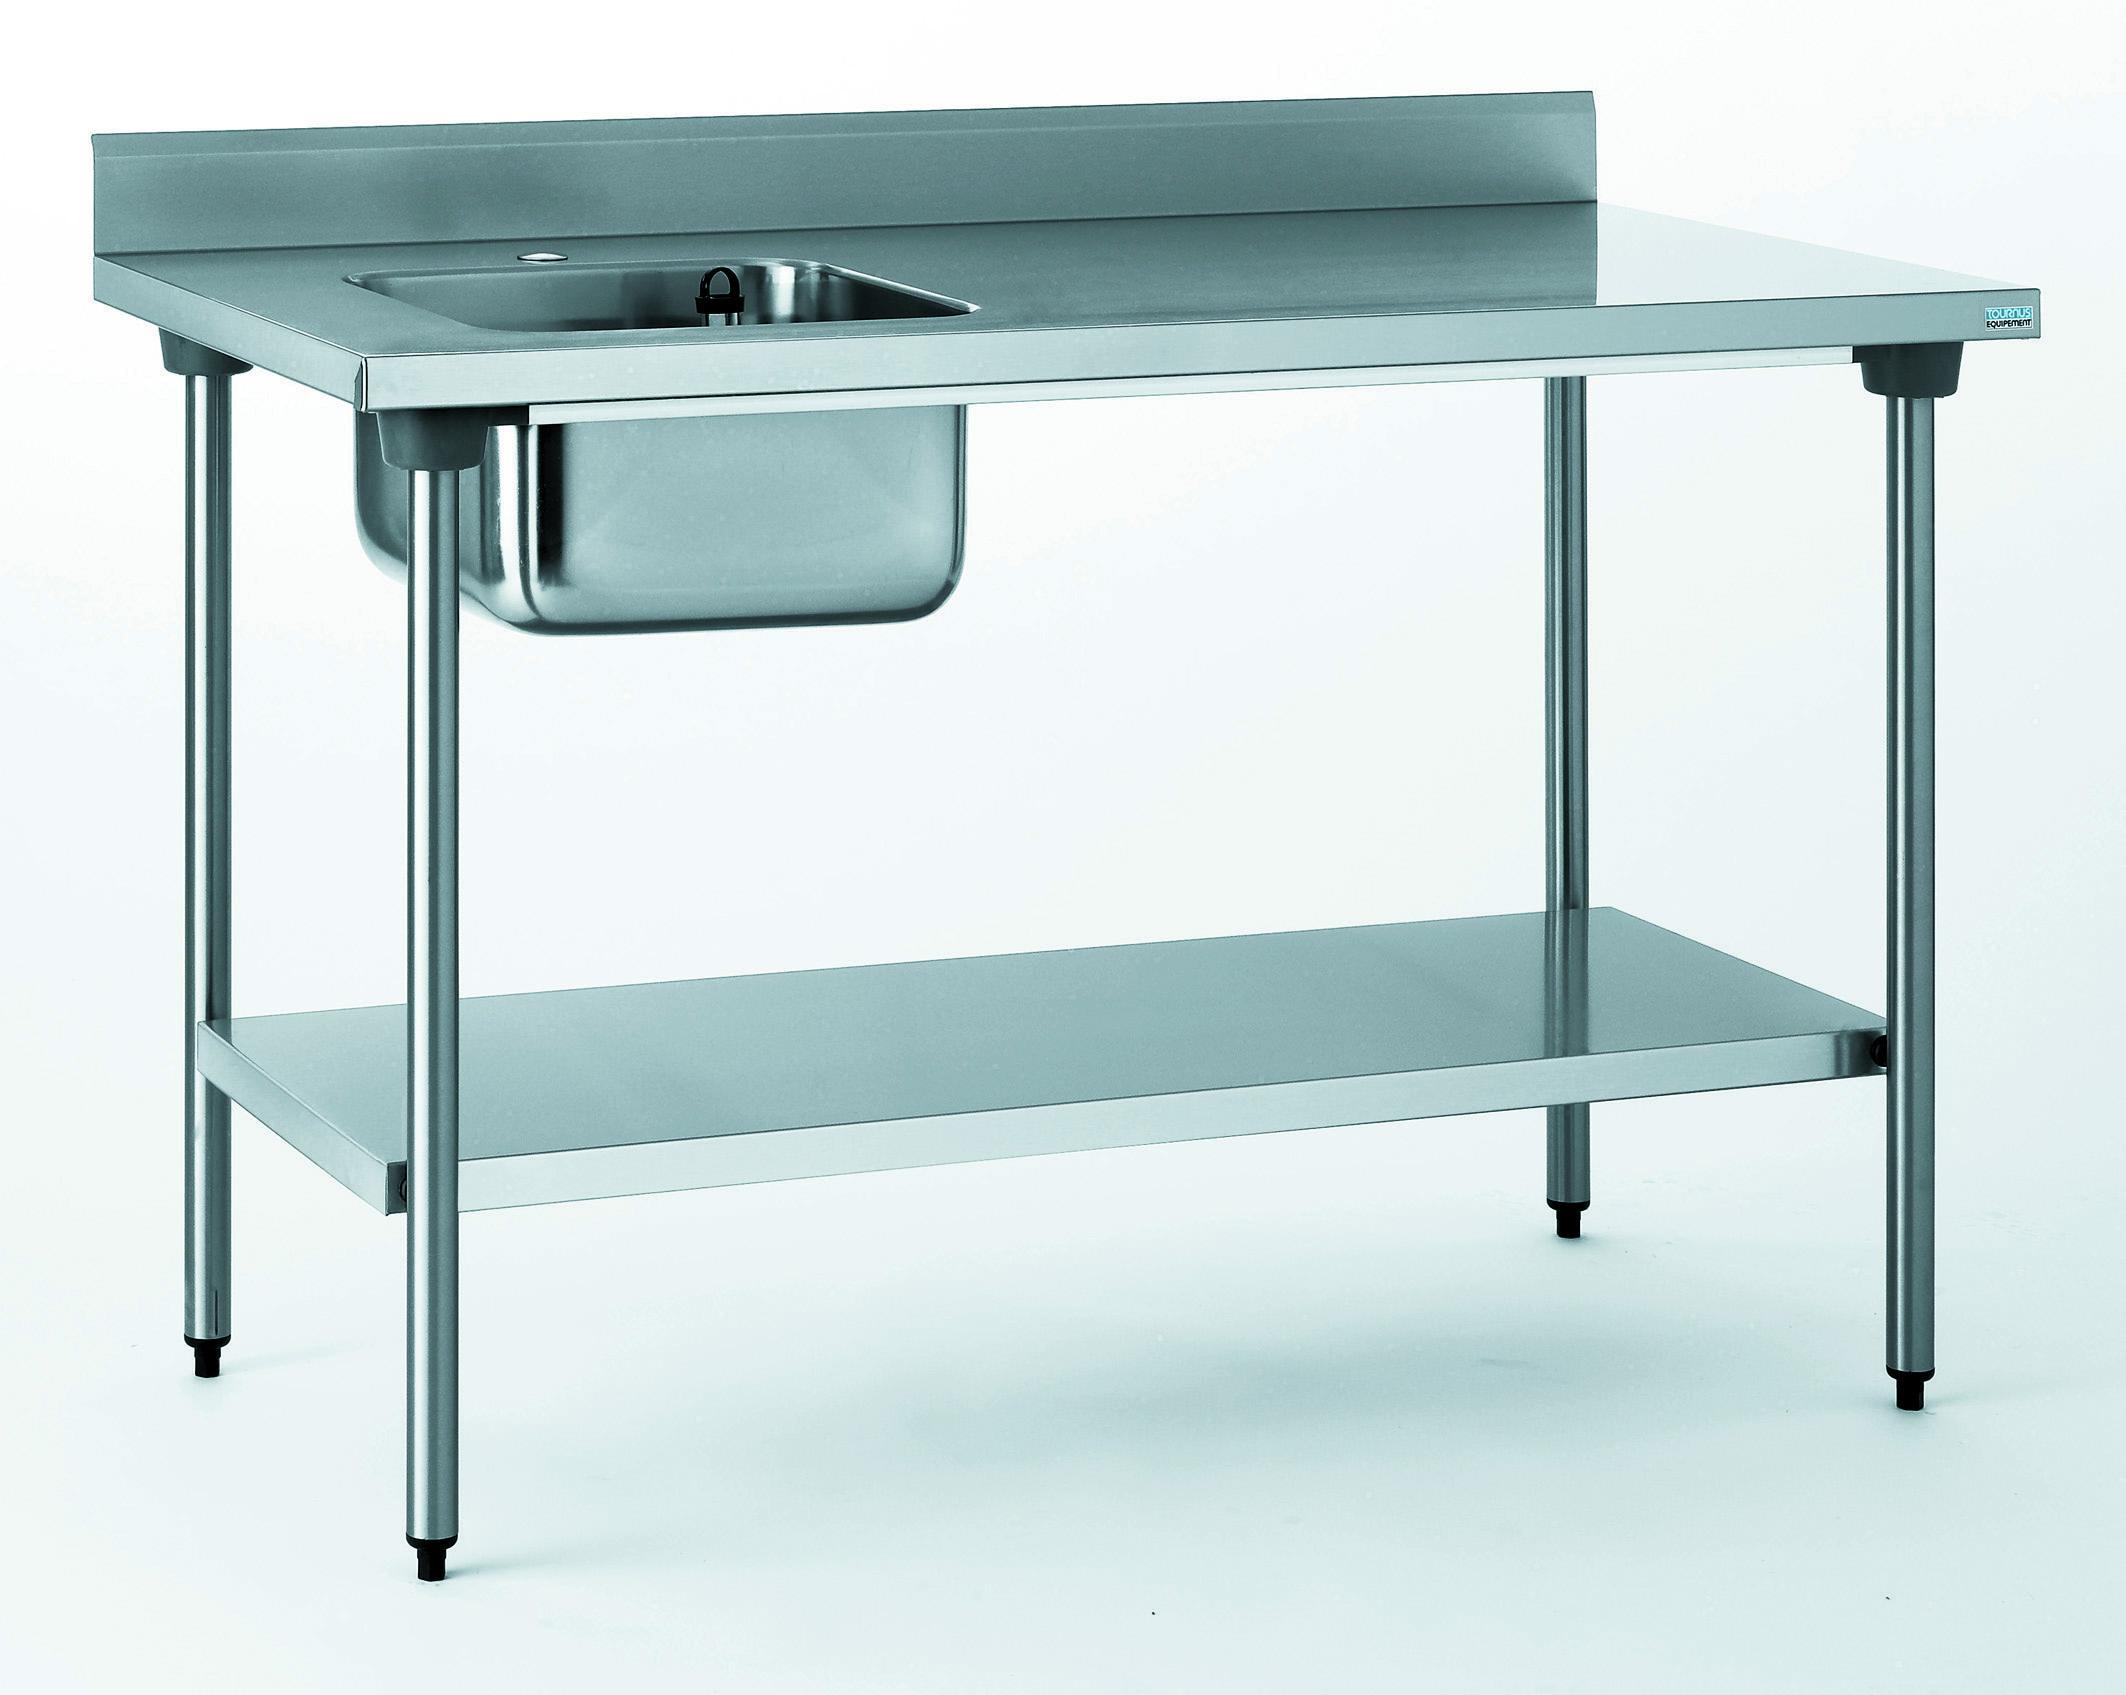 TABLE DU CHEF CHR 700X1200 BAC A GAUCHE+ETAGERE- SANS ROBINE